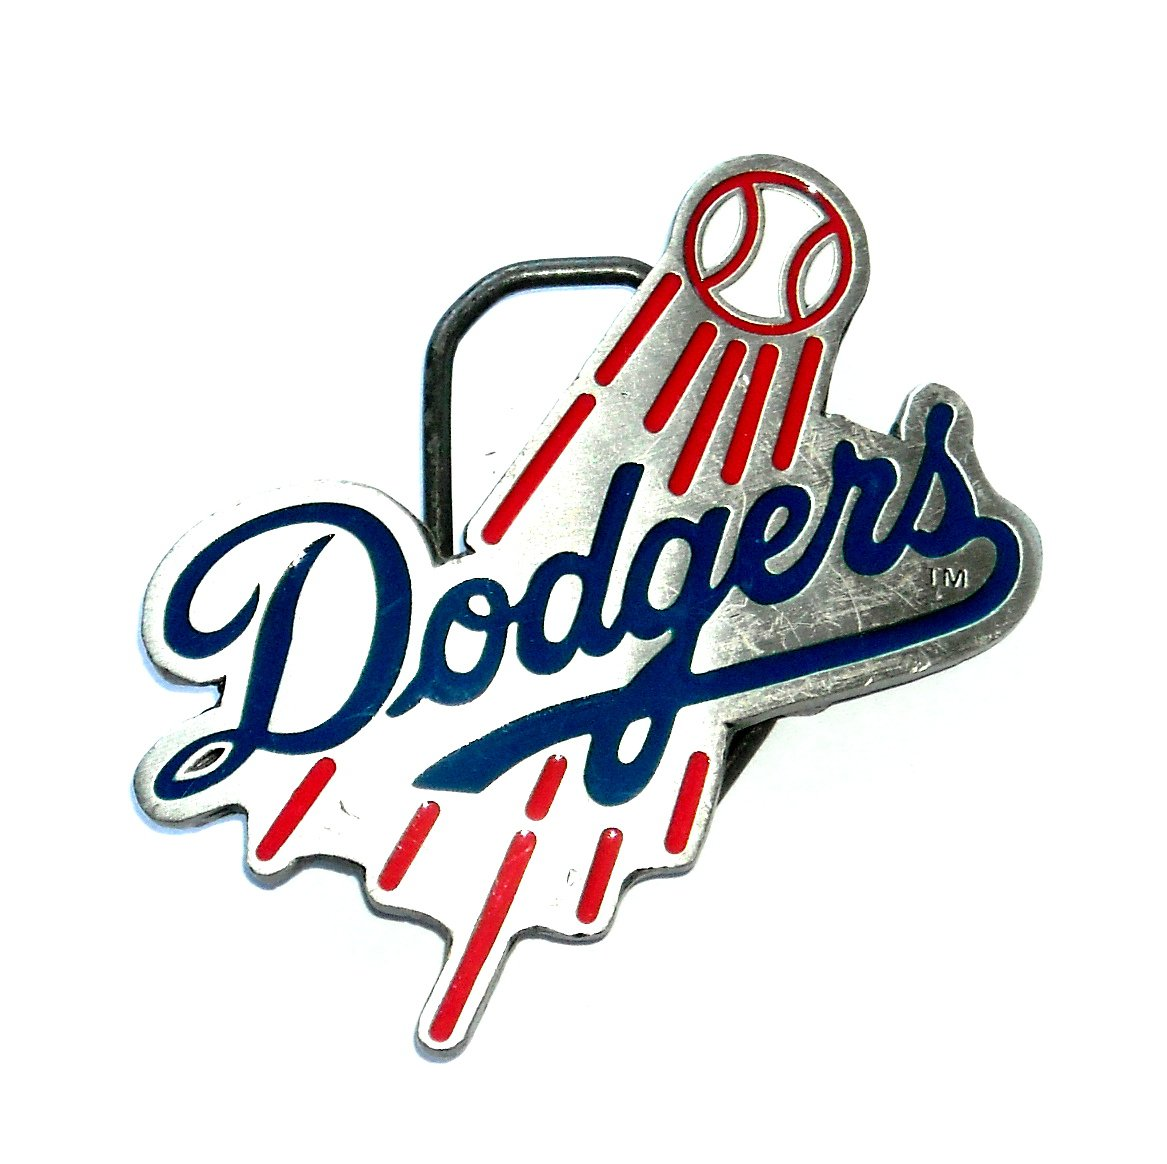 Los Angeles Dodgers Major League Baseball GAP Pewter Belt Buckle